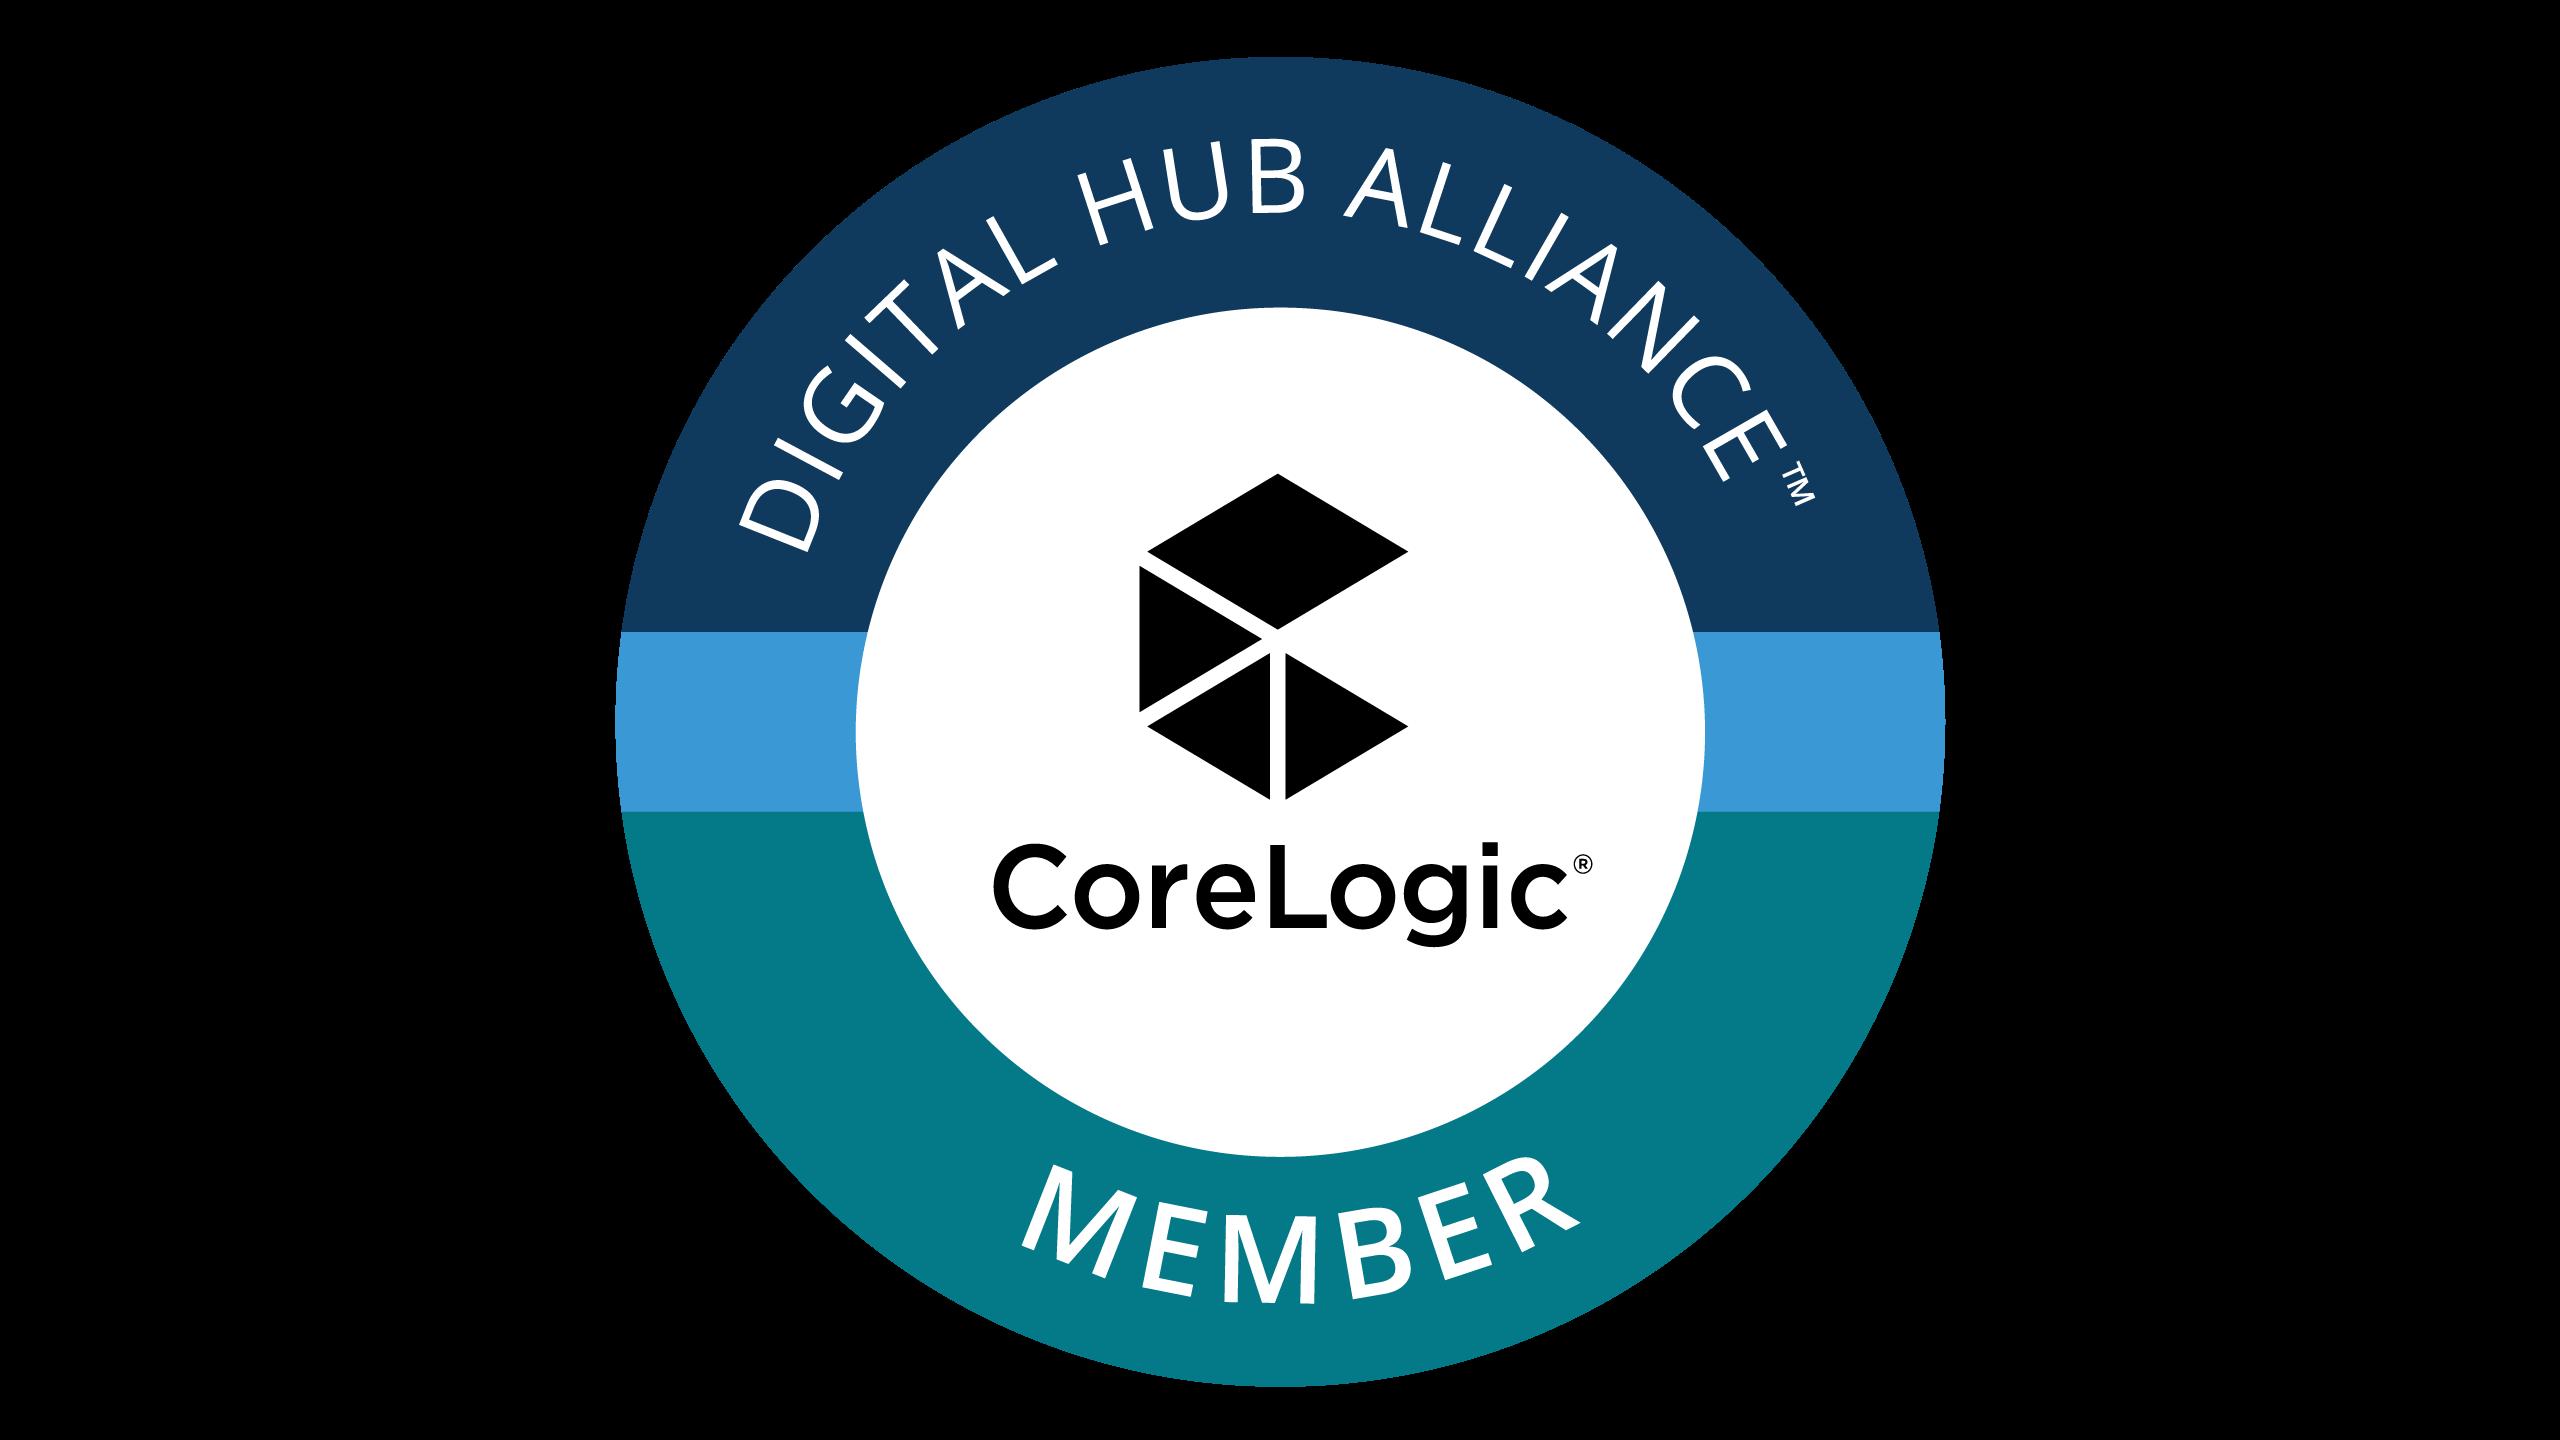 Digital Hub Alliance Member